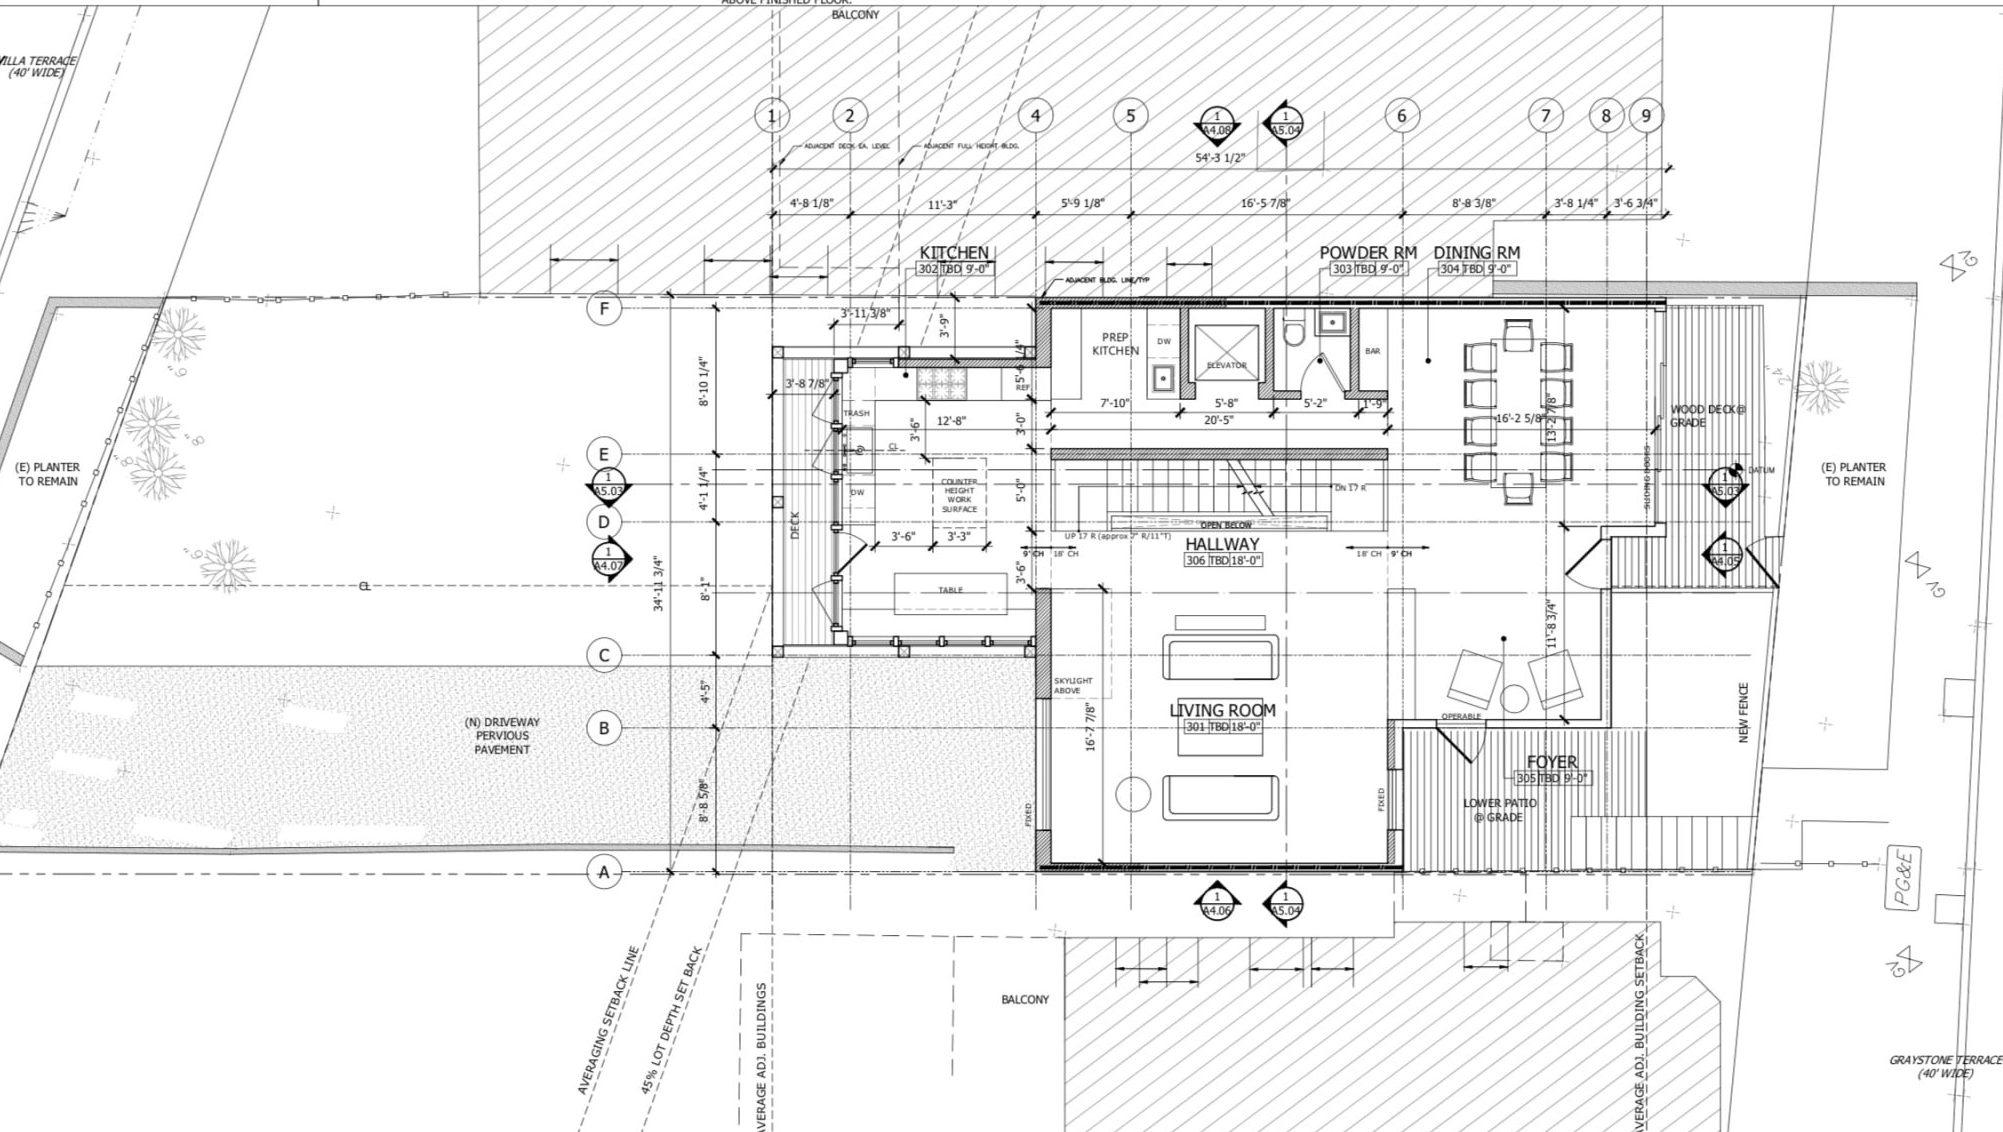 135 Graystone Terrace Third Floor Plan